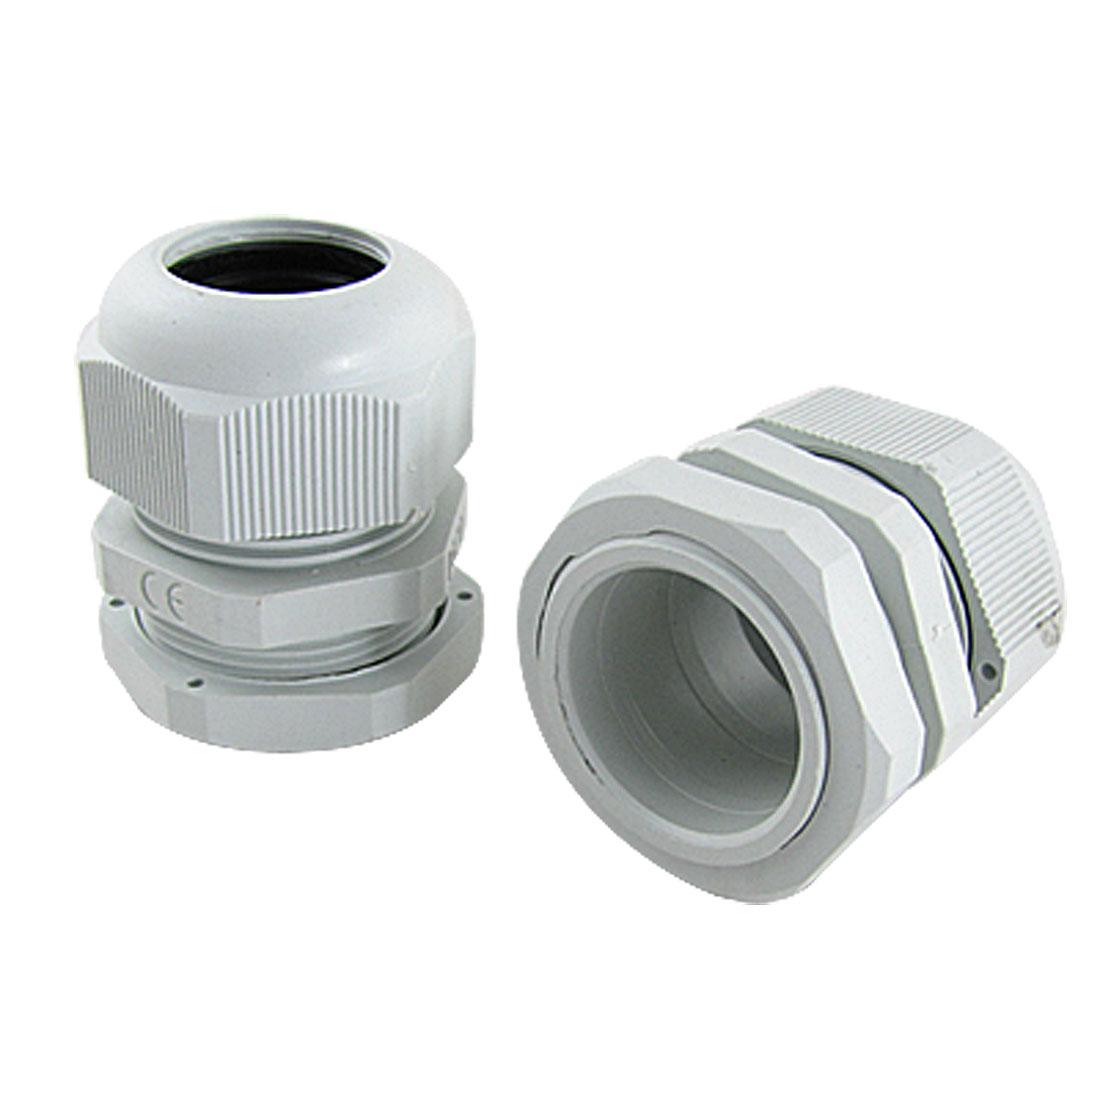 2 Pcs Waterproof M32 White Plastic Glands Connectors for 16-21mm Cables